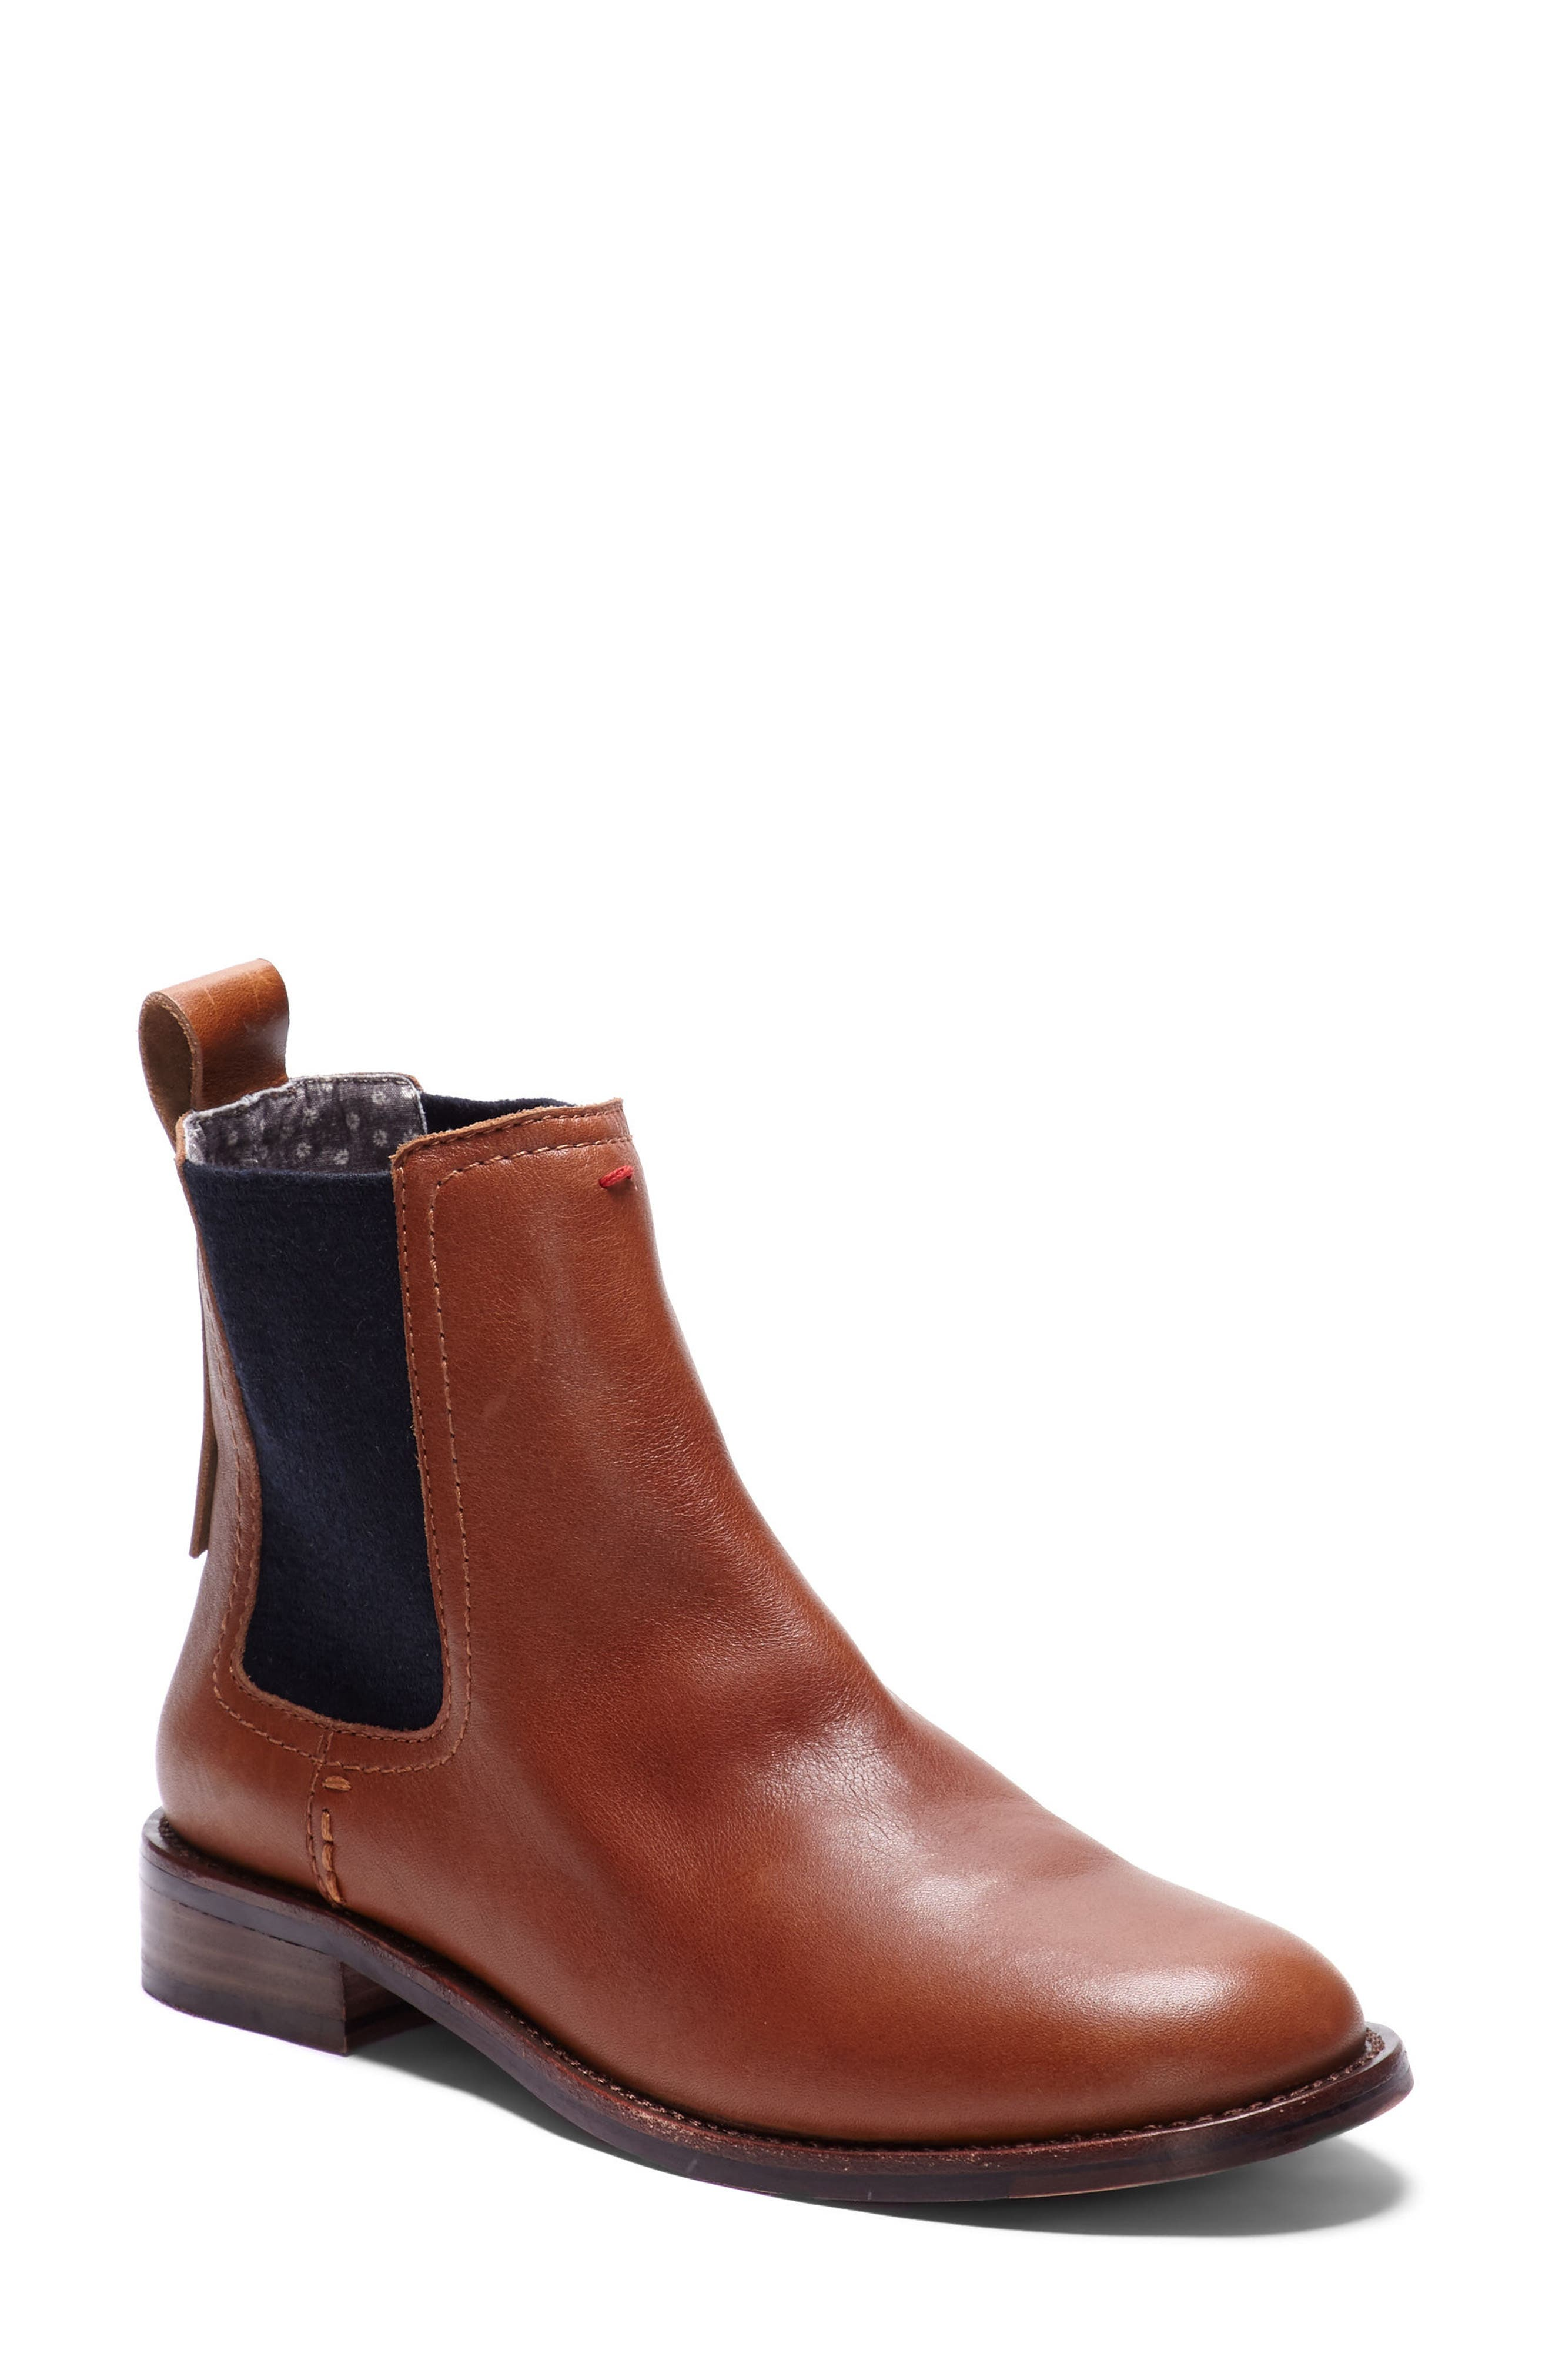 Zabi Chelsea Boot,                         Main,                         color, Yam Leather